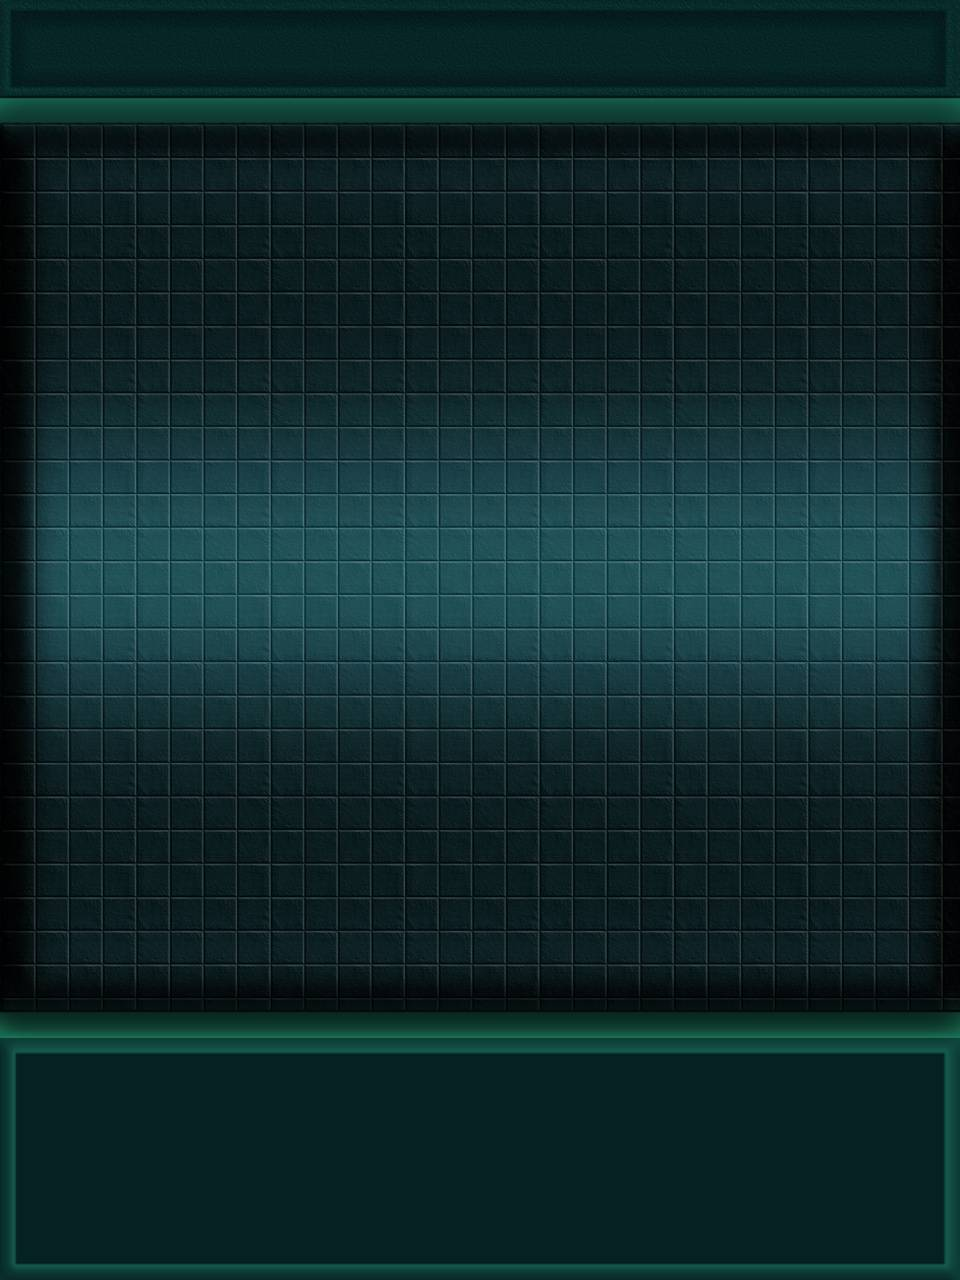 Basic System Display